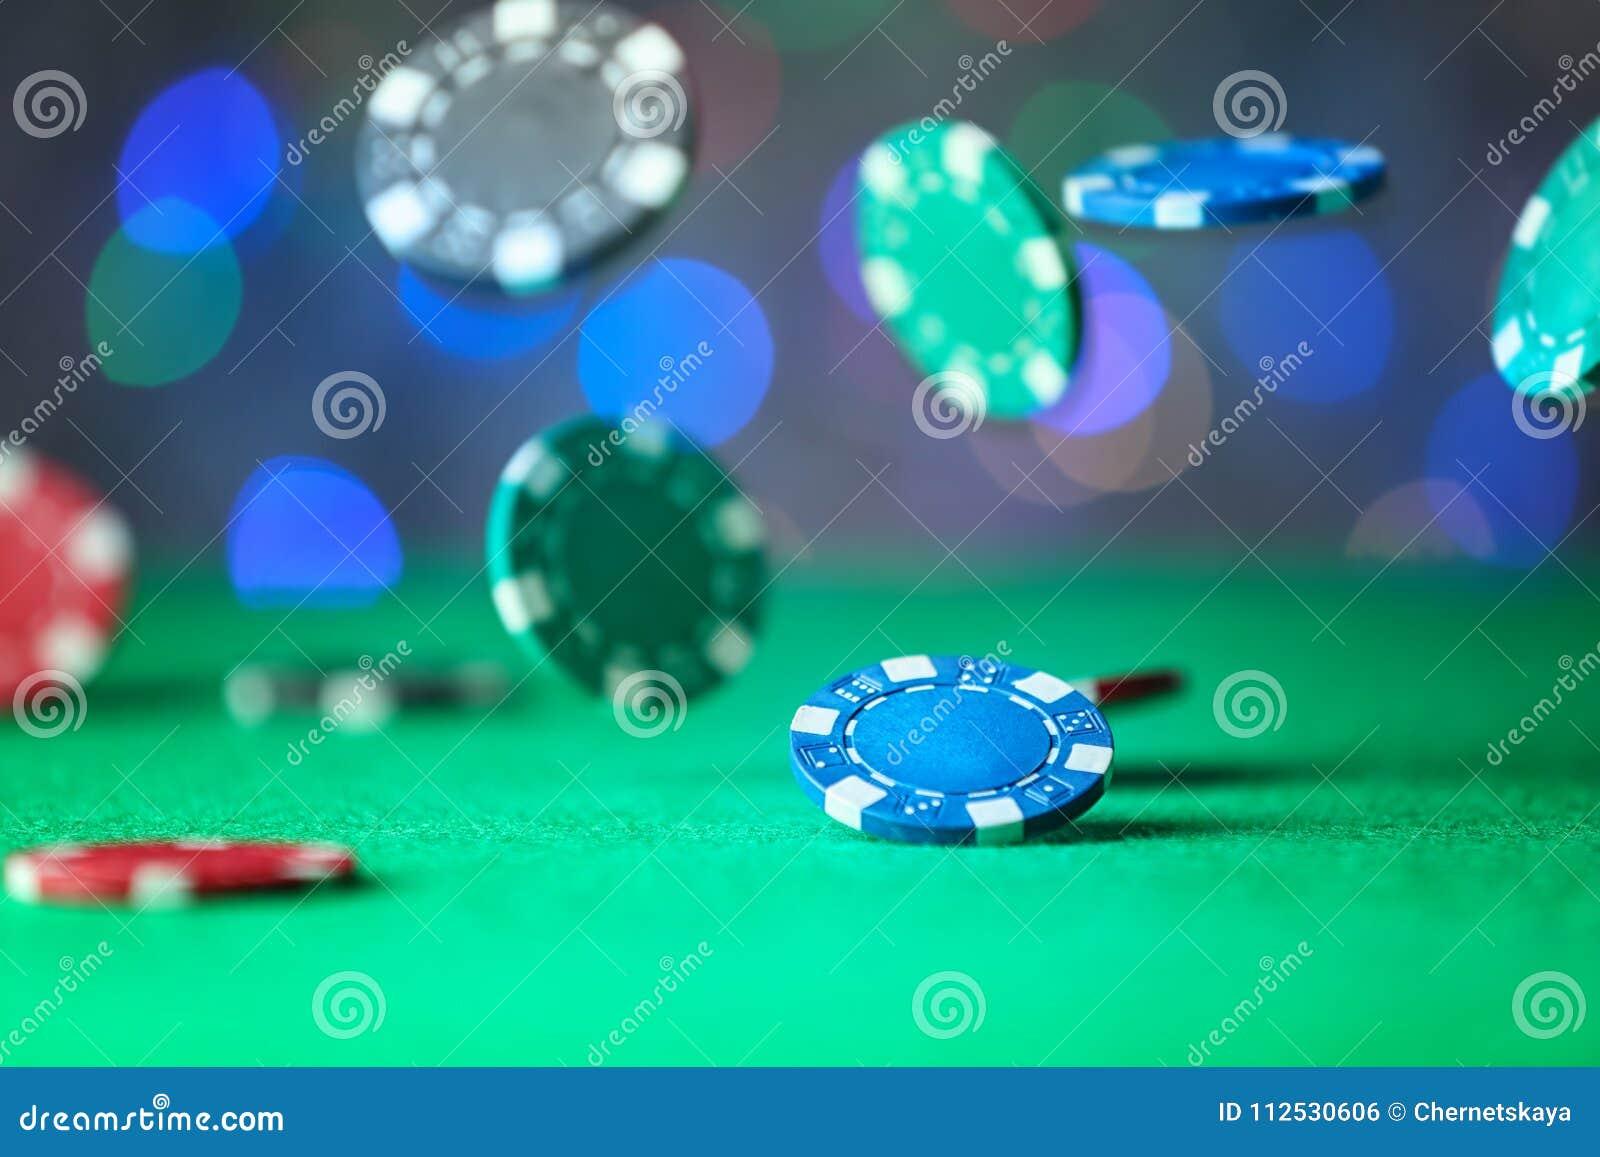 Gambling chips falling on green table